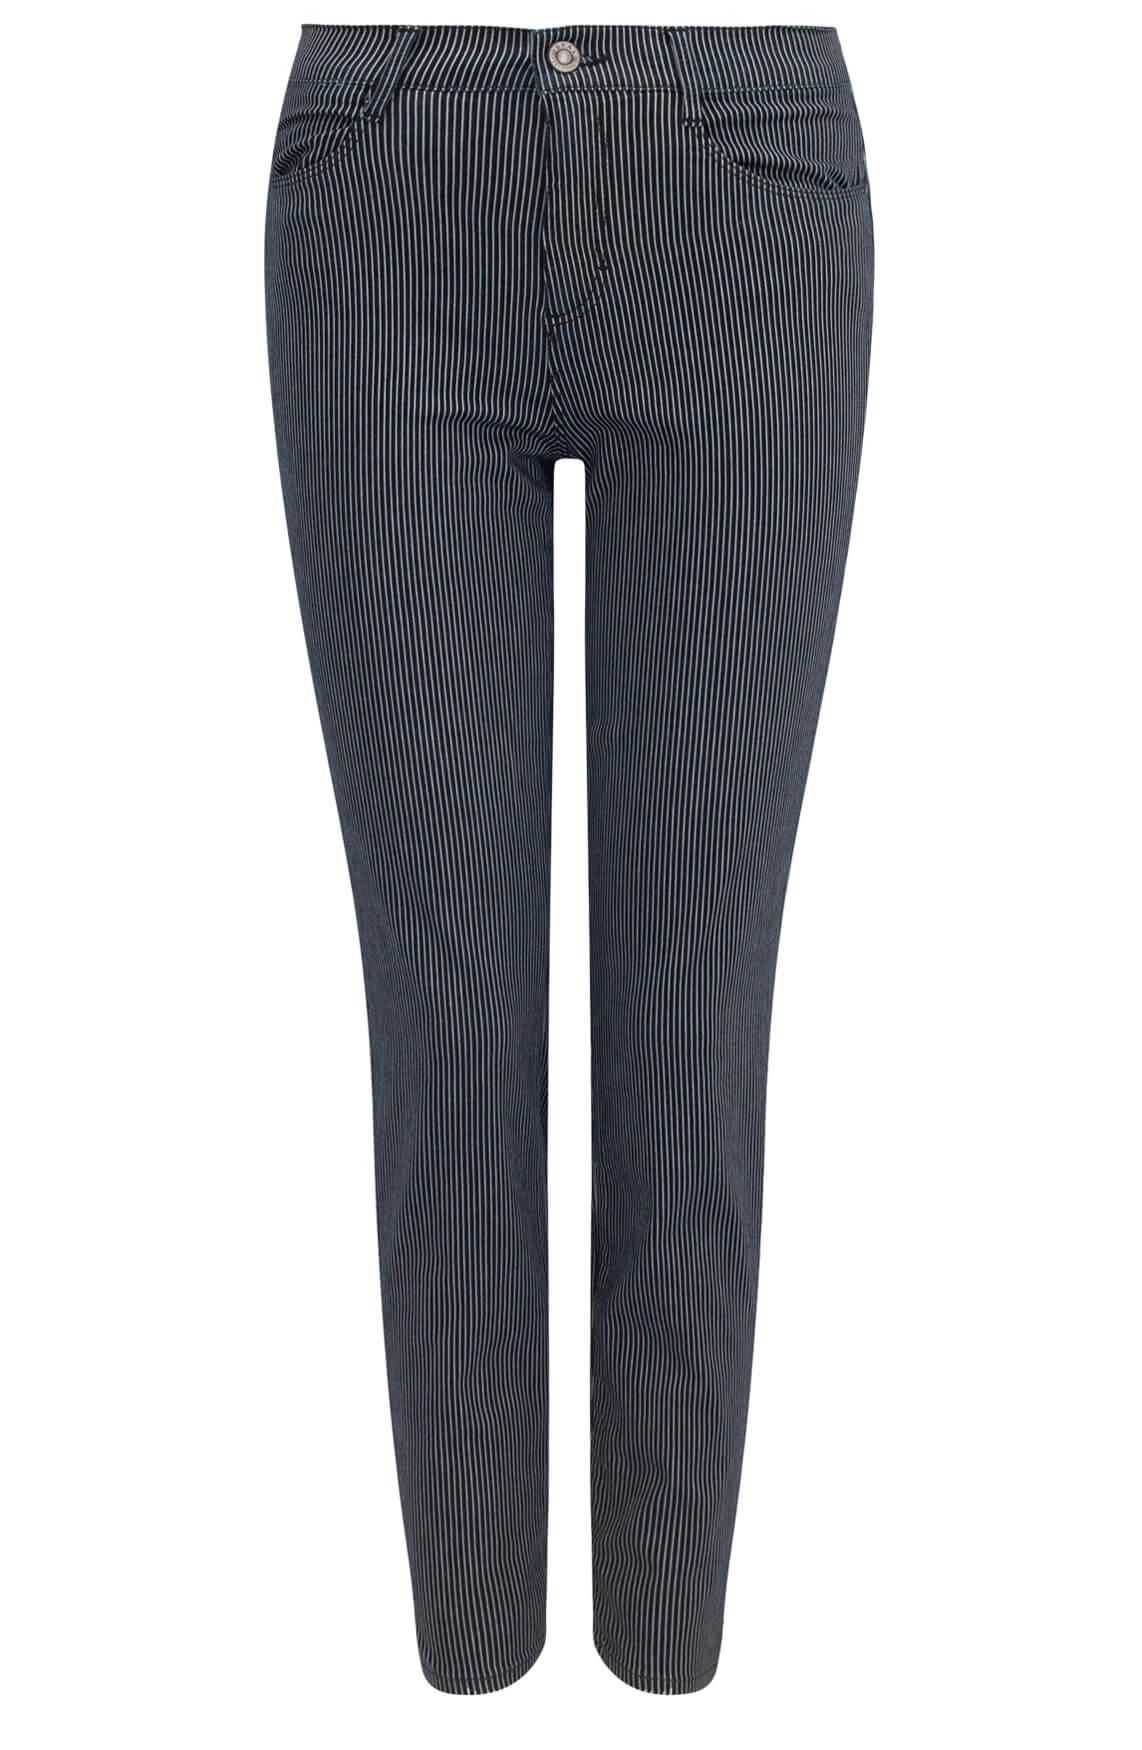 Brax Dames Shakira jeans Blauw